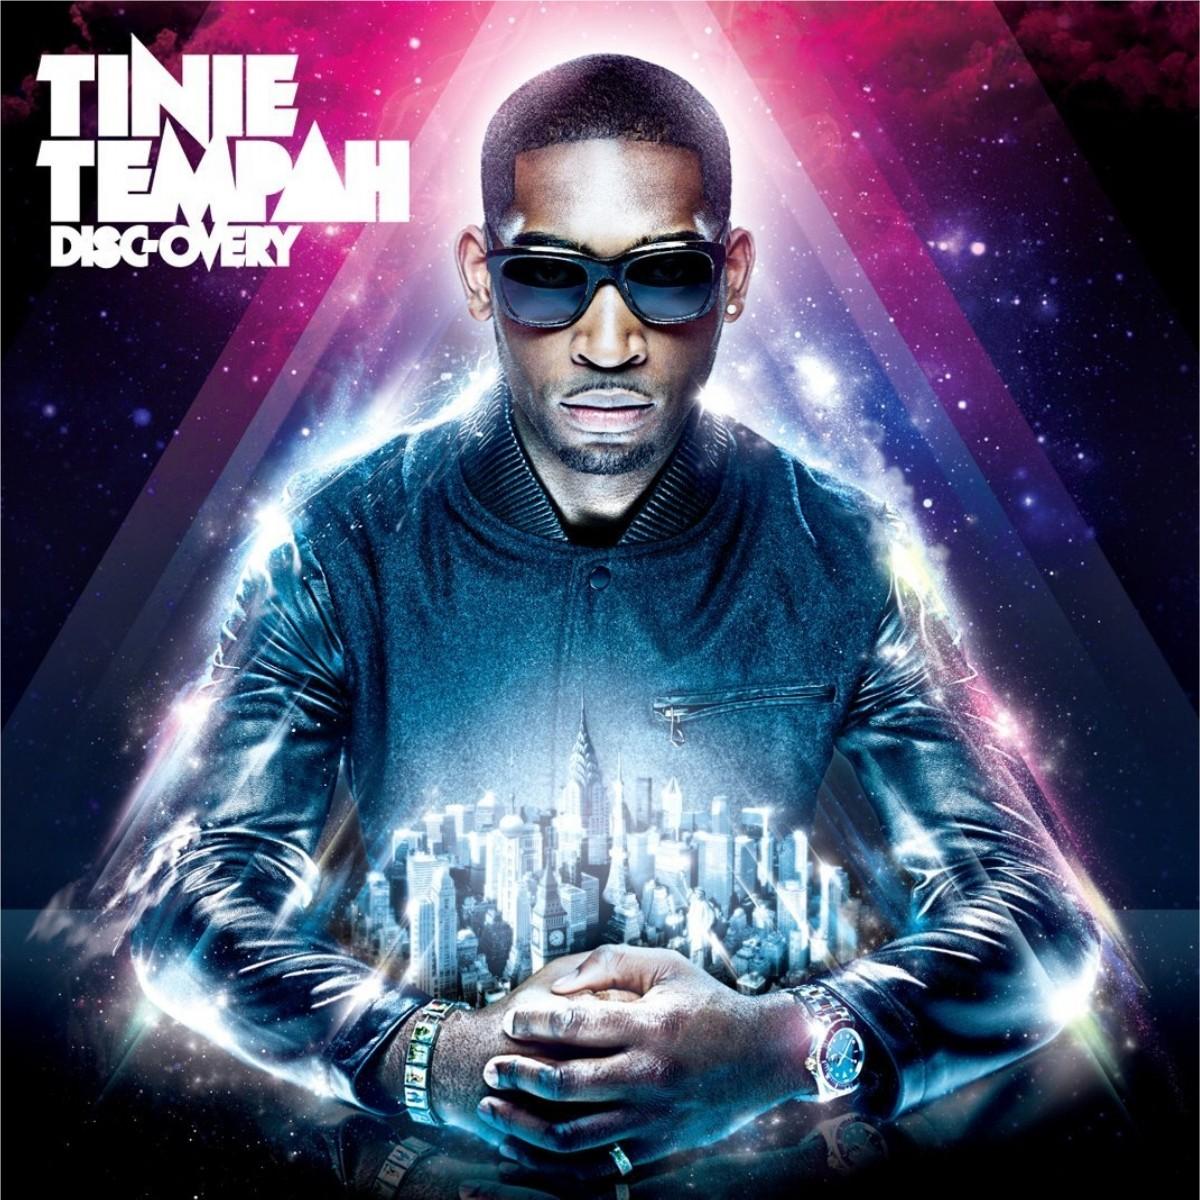 http://1.bp.blogspot.com/_mupIVJbjvuU/THiQD9Hf8gI/AAAAAAAAGQ0/_L91NG4k5_k/s1600/Tinie+Tempah+-+Disc-Overy+(Official+Album+Cover).jpg